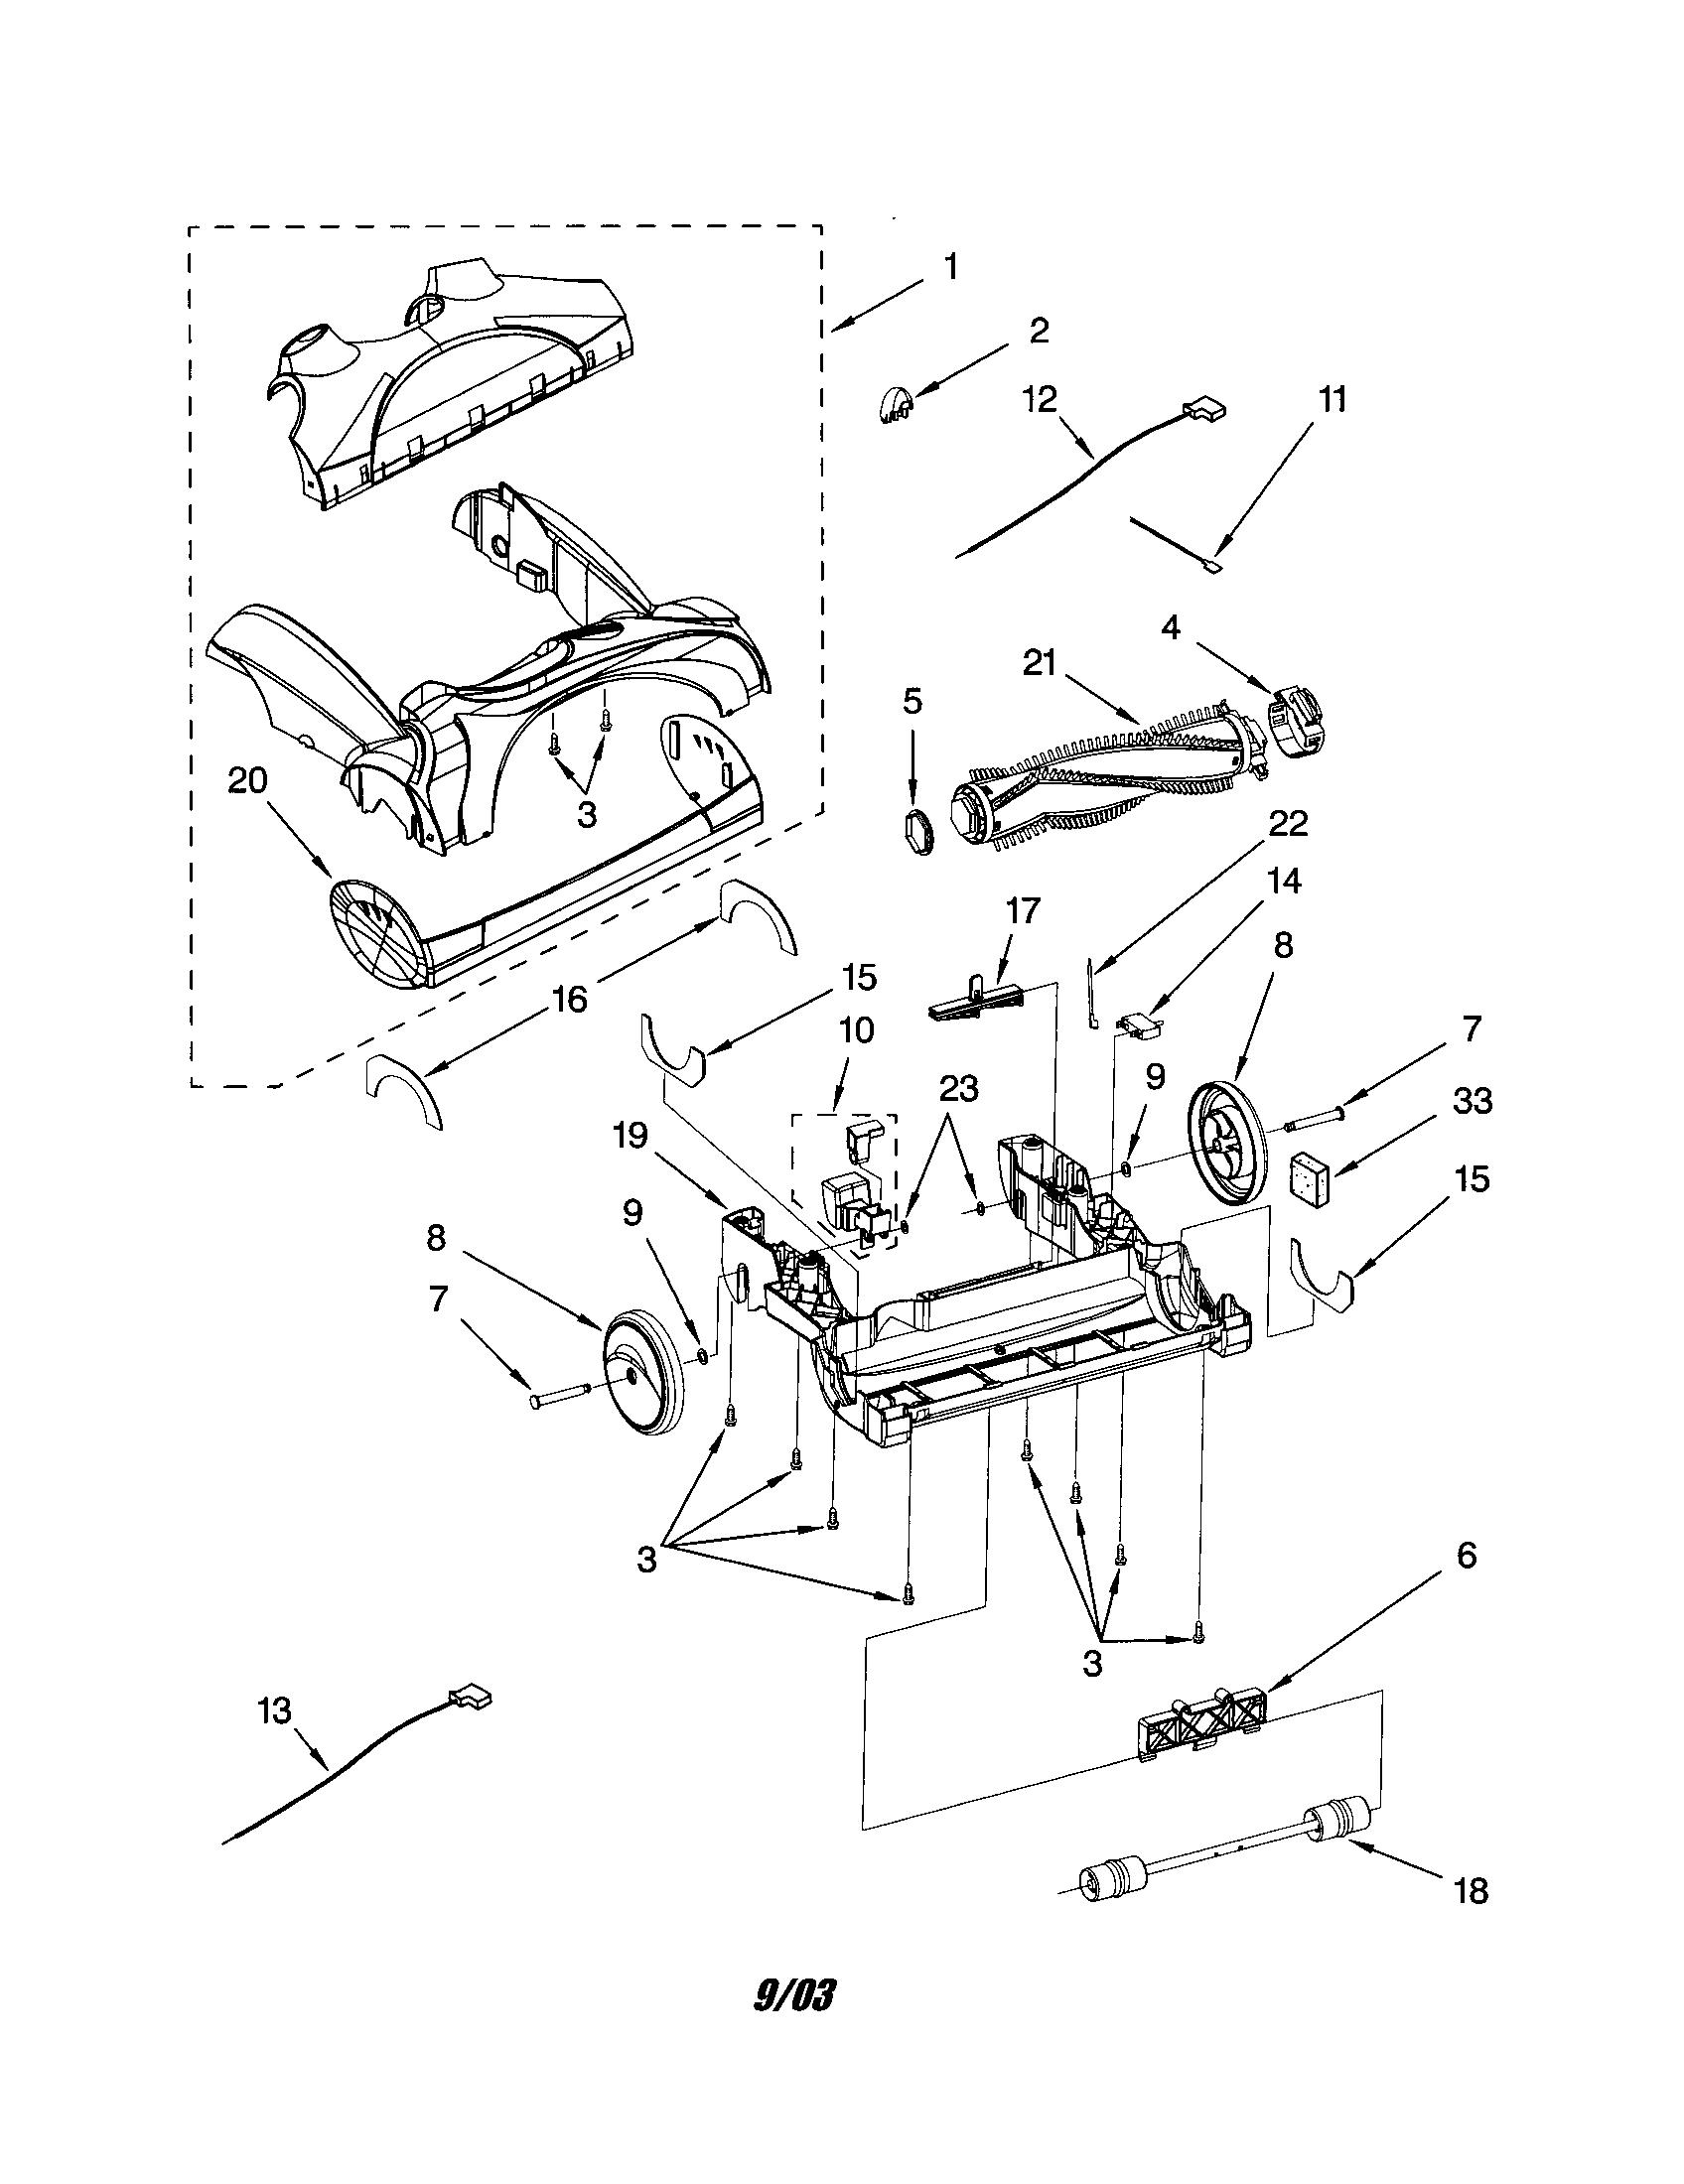 Kenmore model 11632913200 vacuum, upright genuine parts